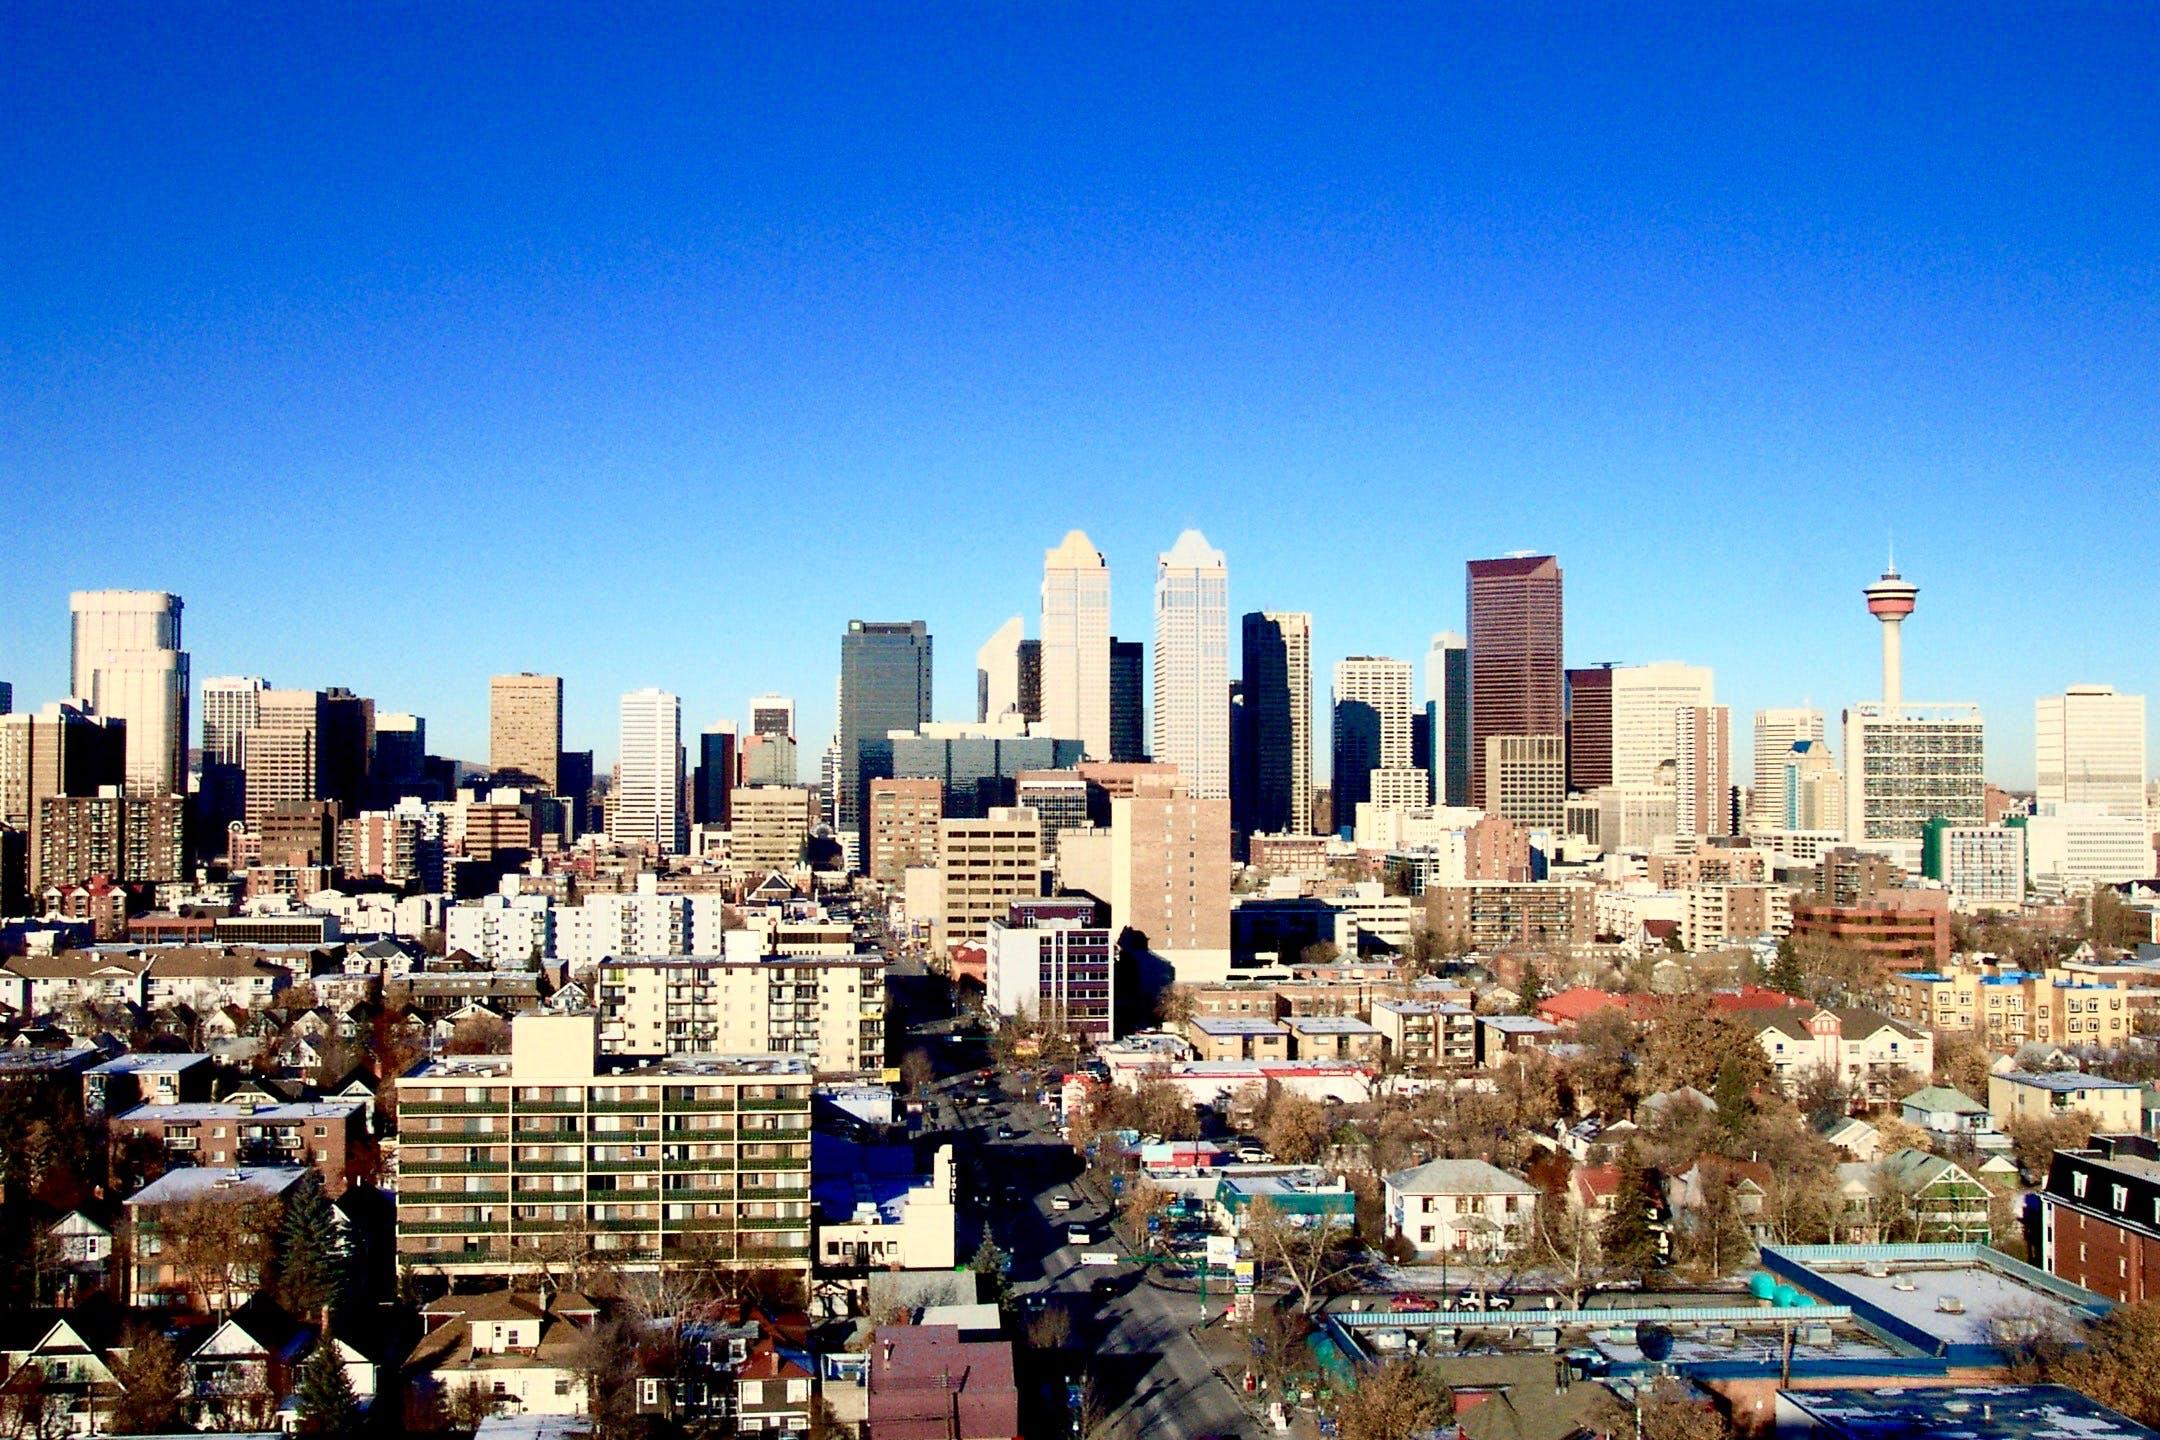 Free stock photo of Calgary Downtown